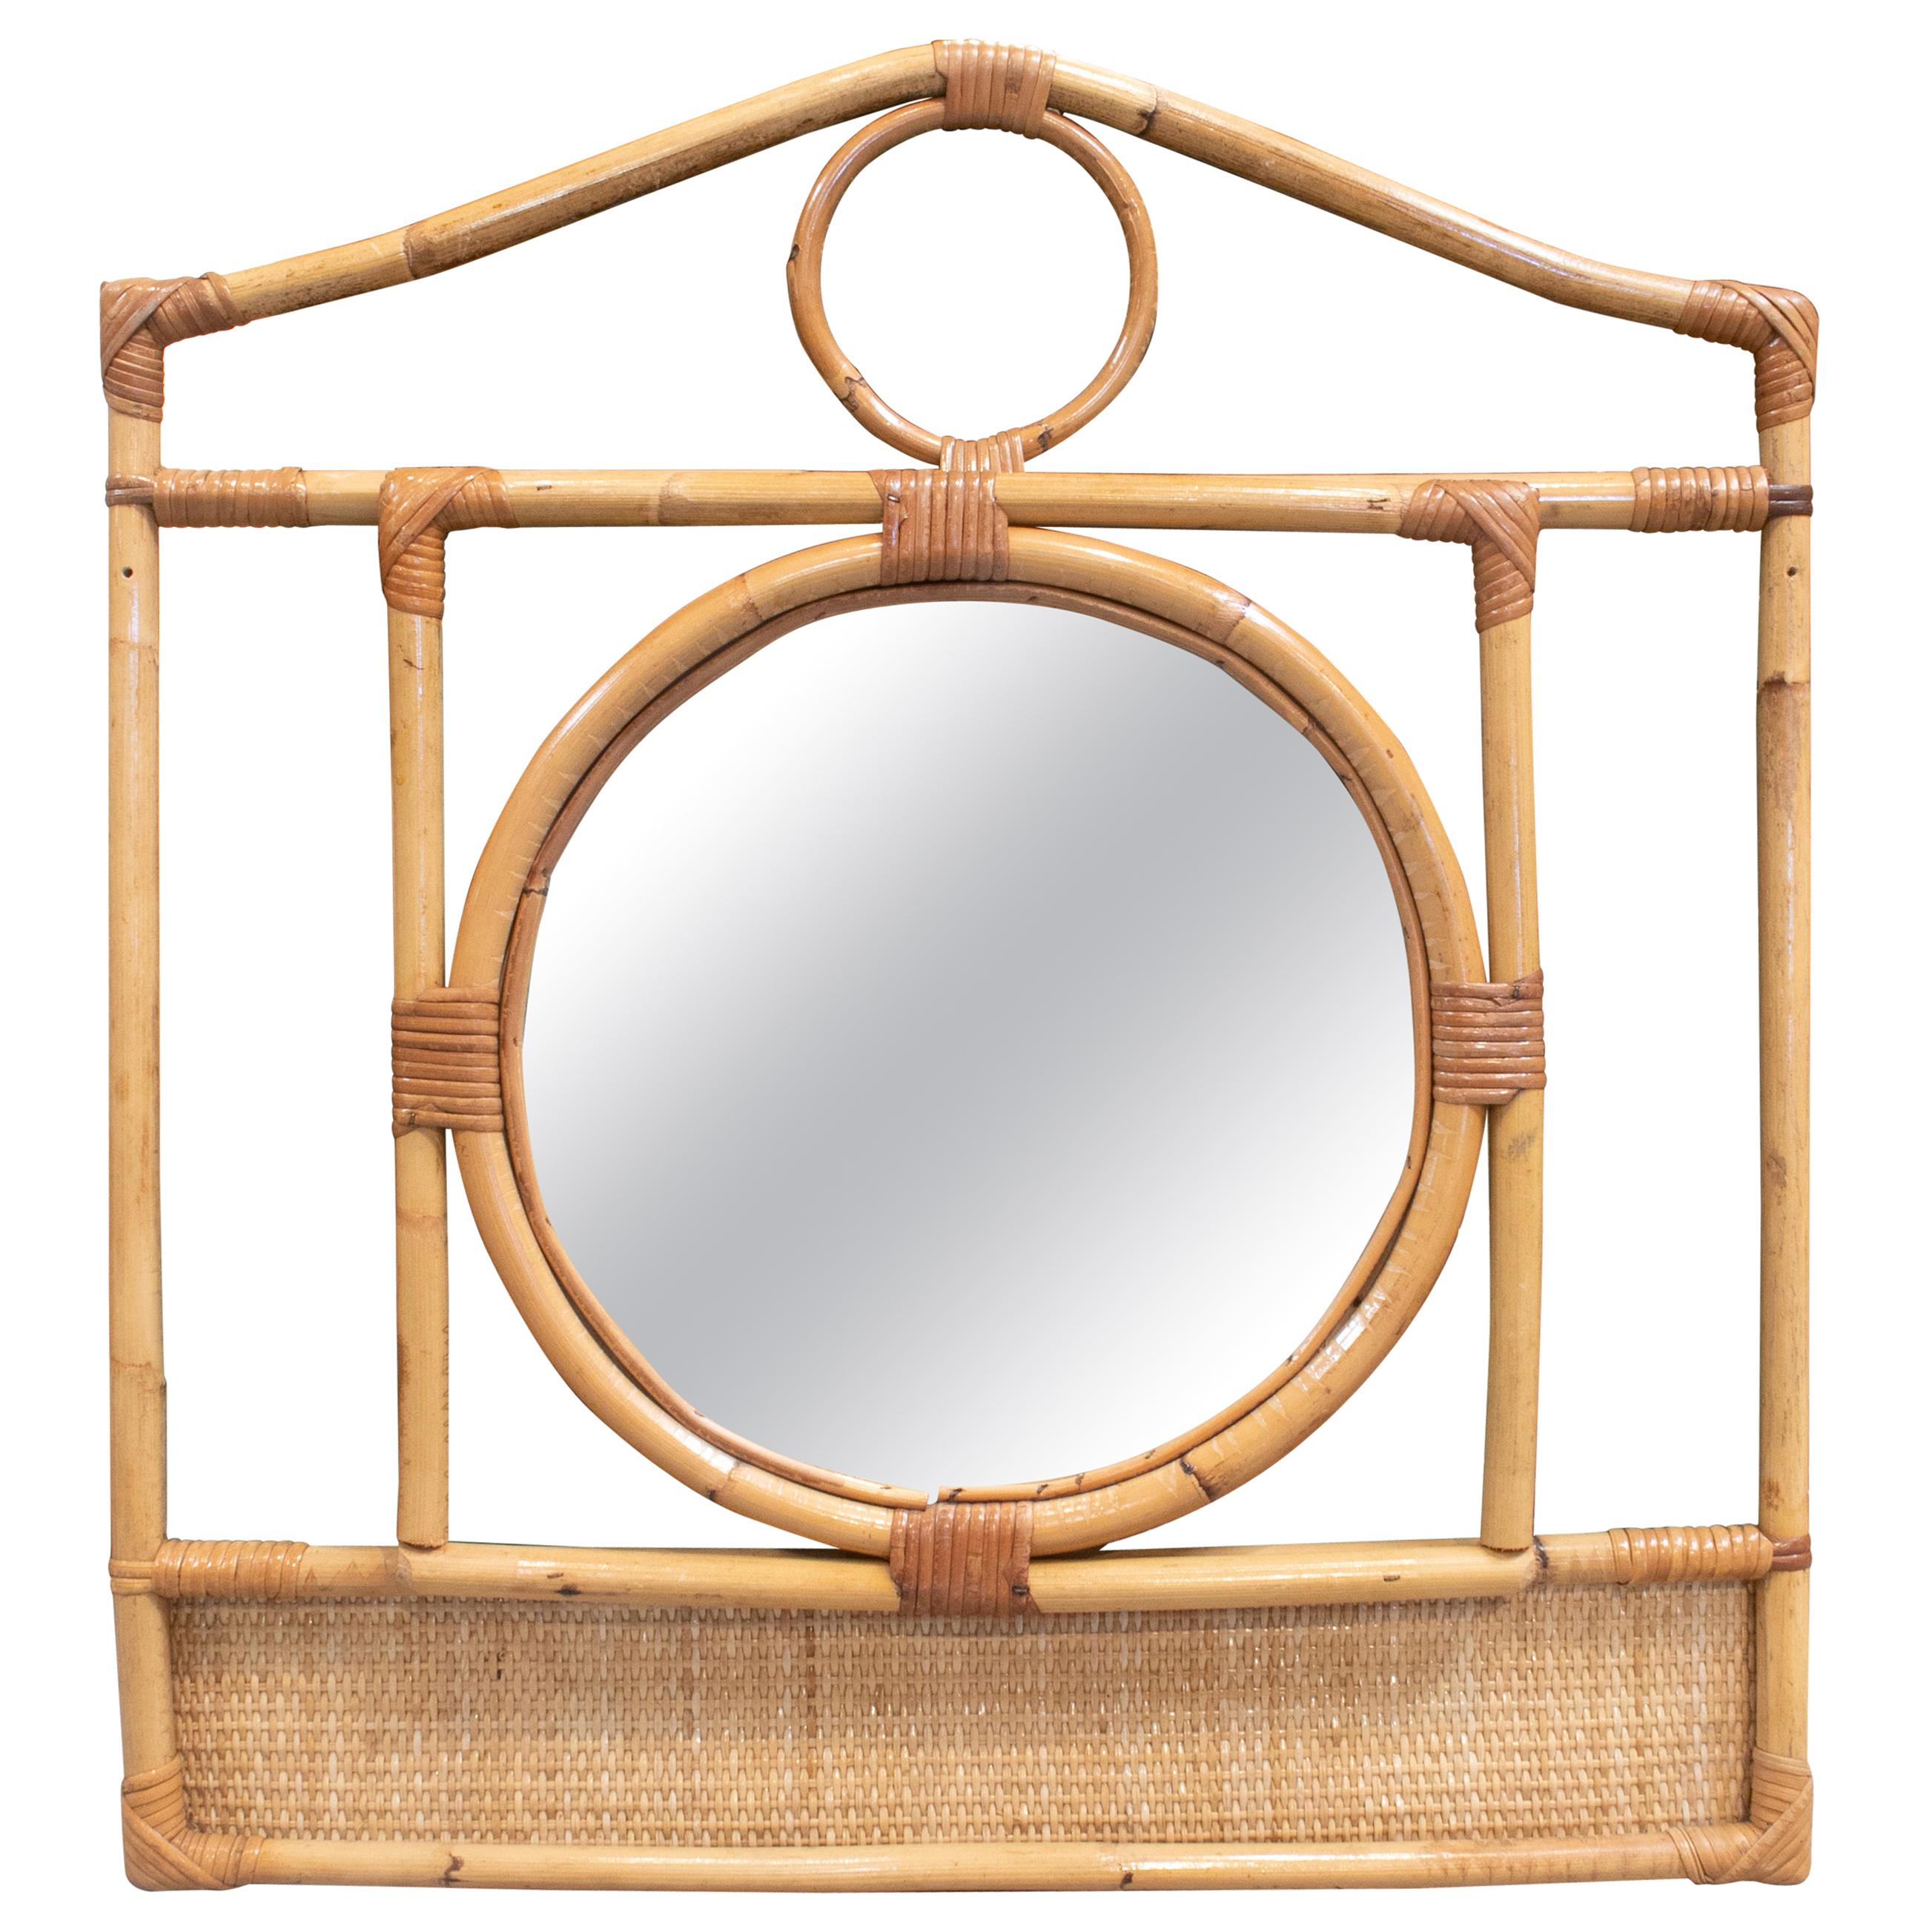 1970s Spanish Bamboo and Rattan Mirror